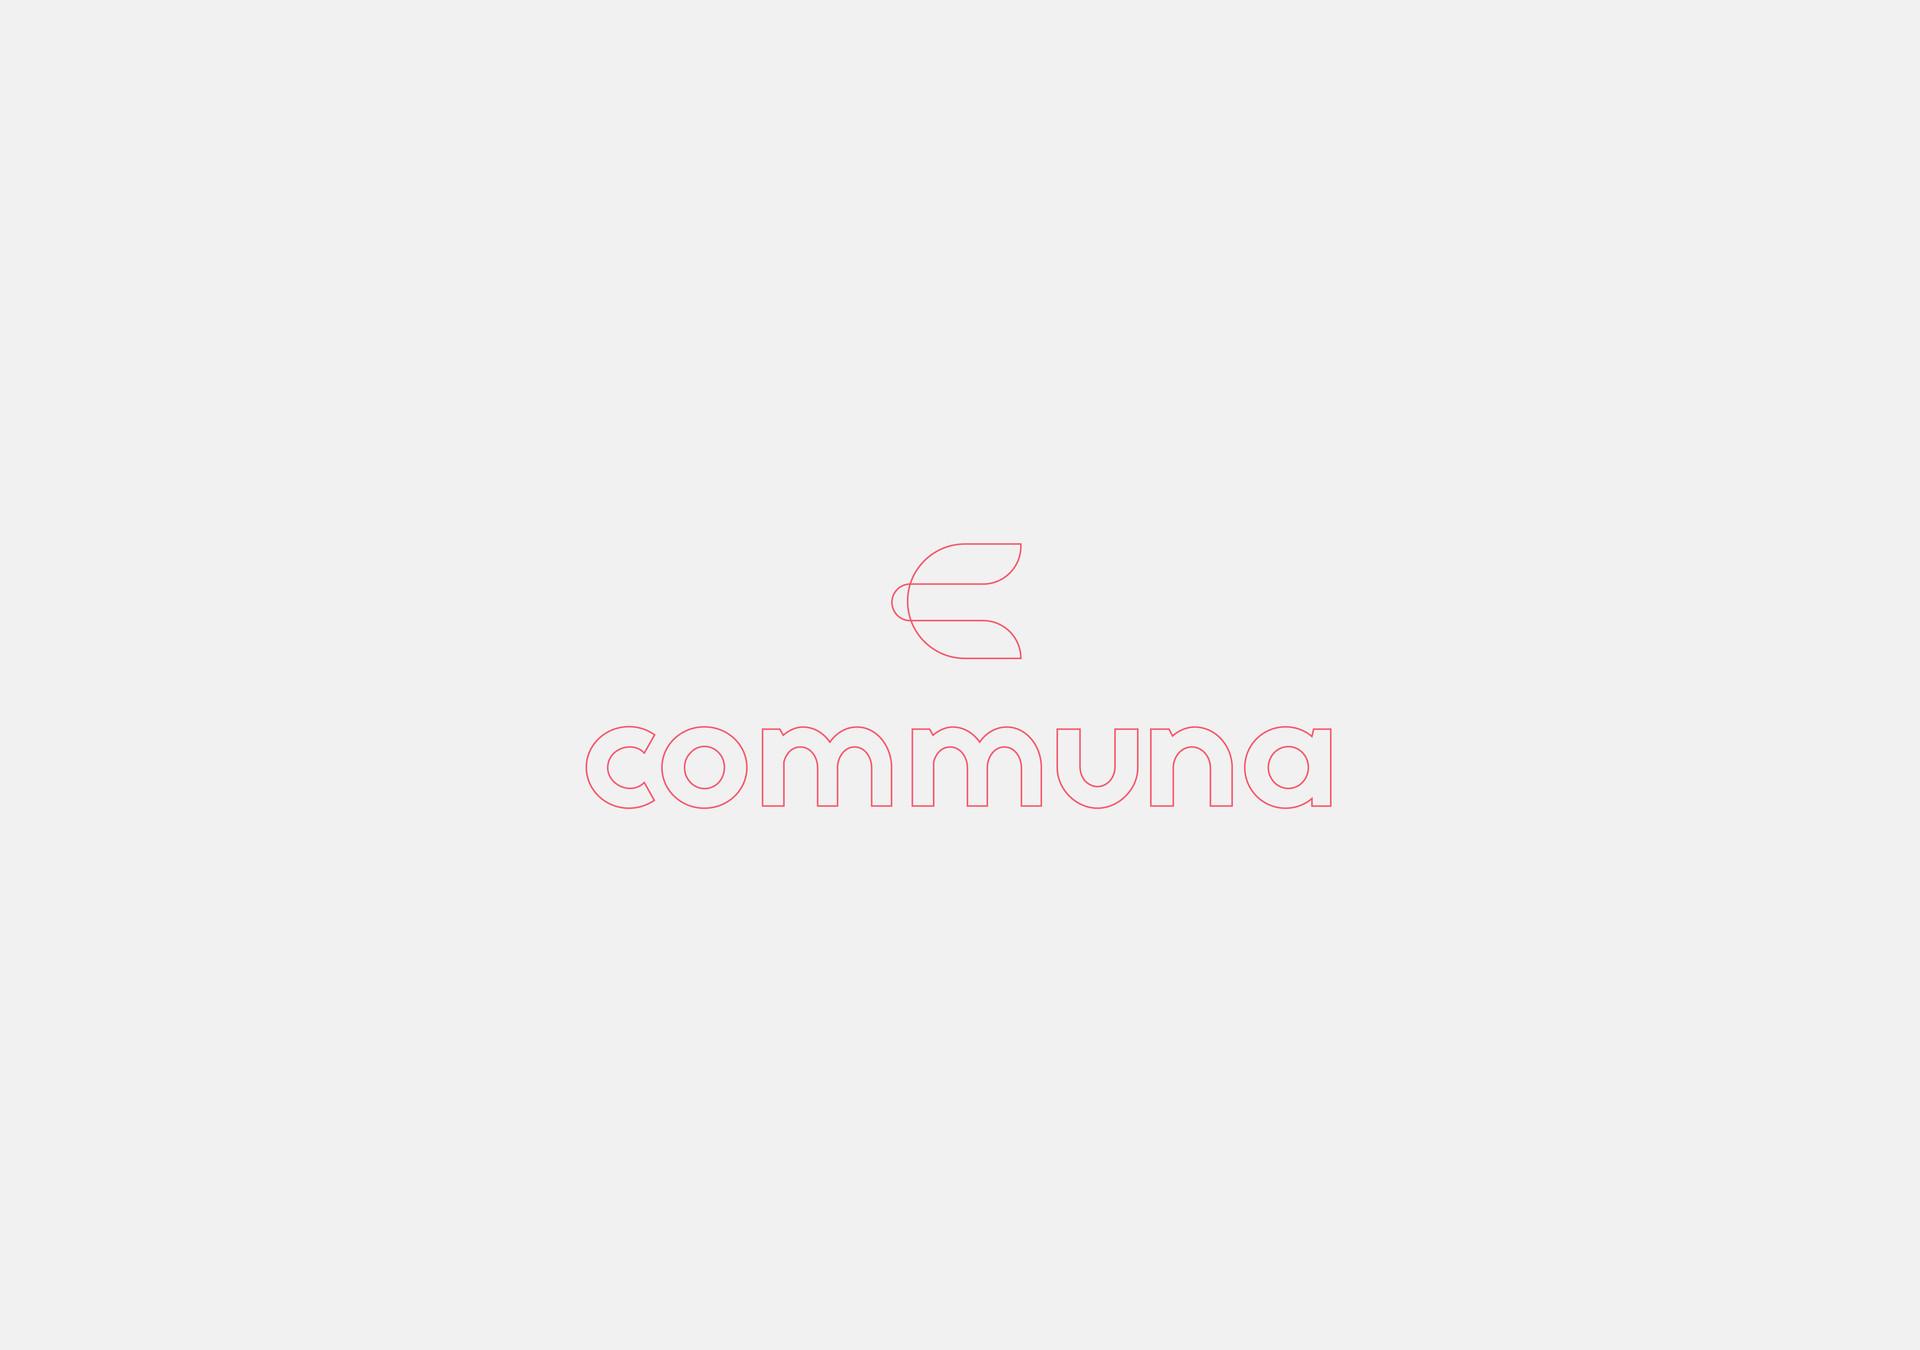 Communa_CaseStudy copy-01.jpg